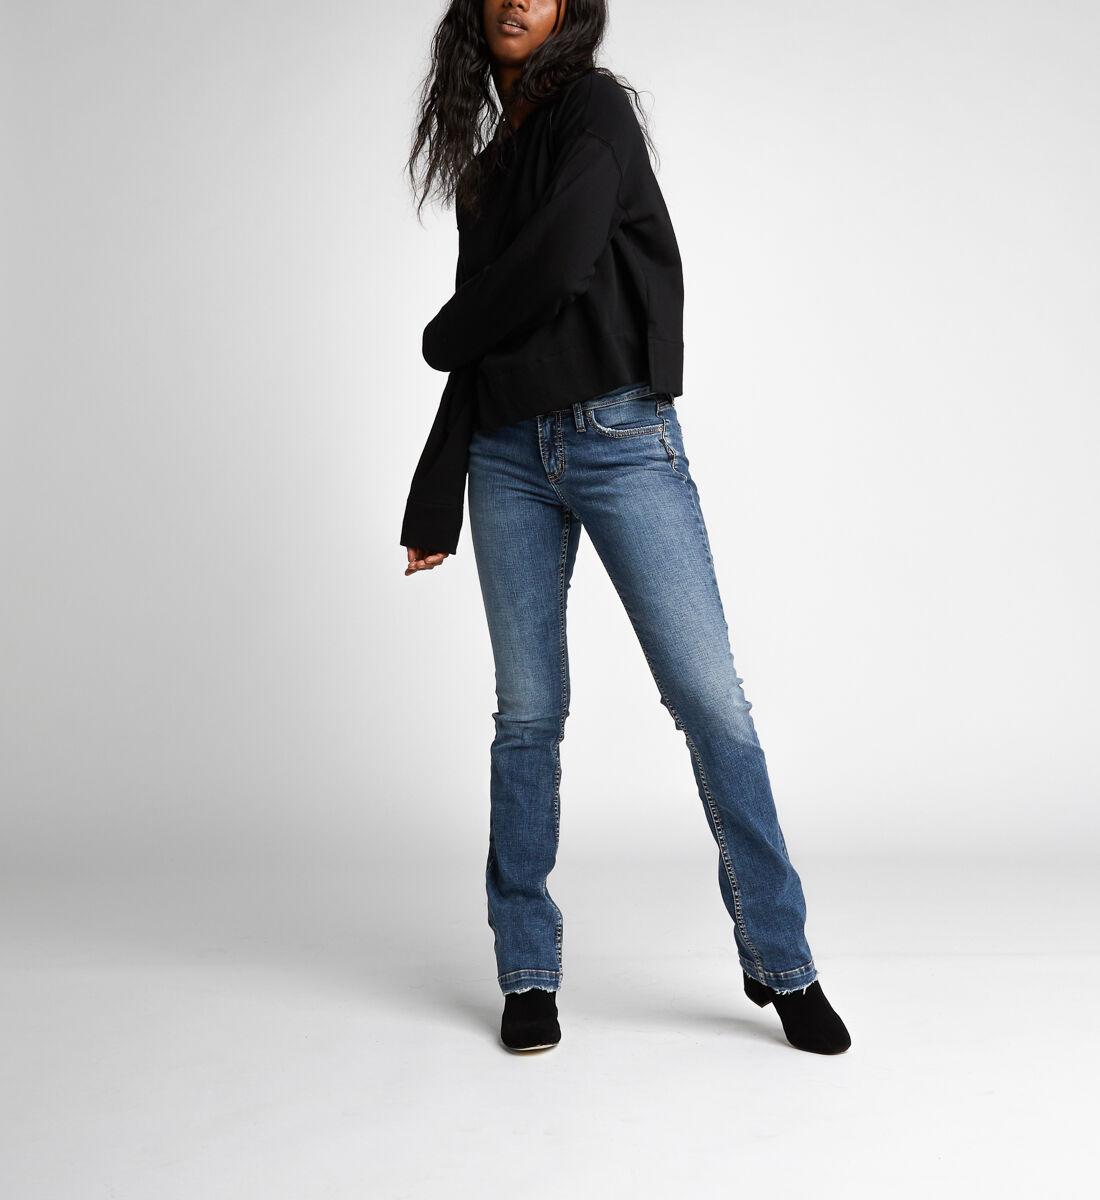 Elyse Mid Rise Slim Bootcut Jeans Alt Image 1